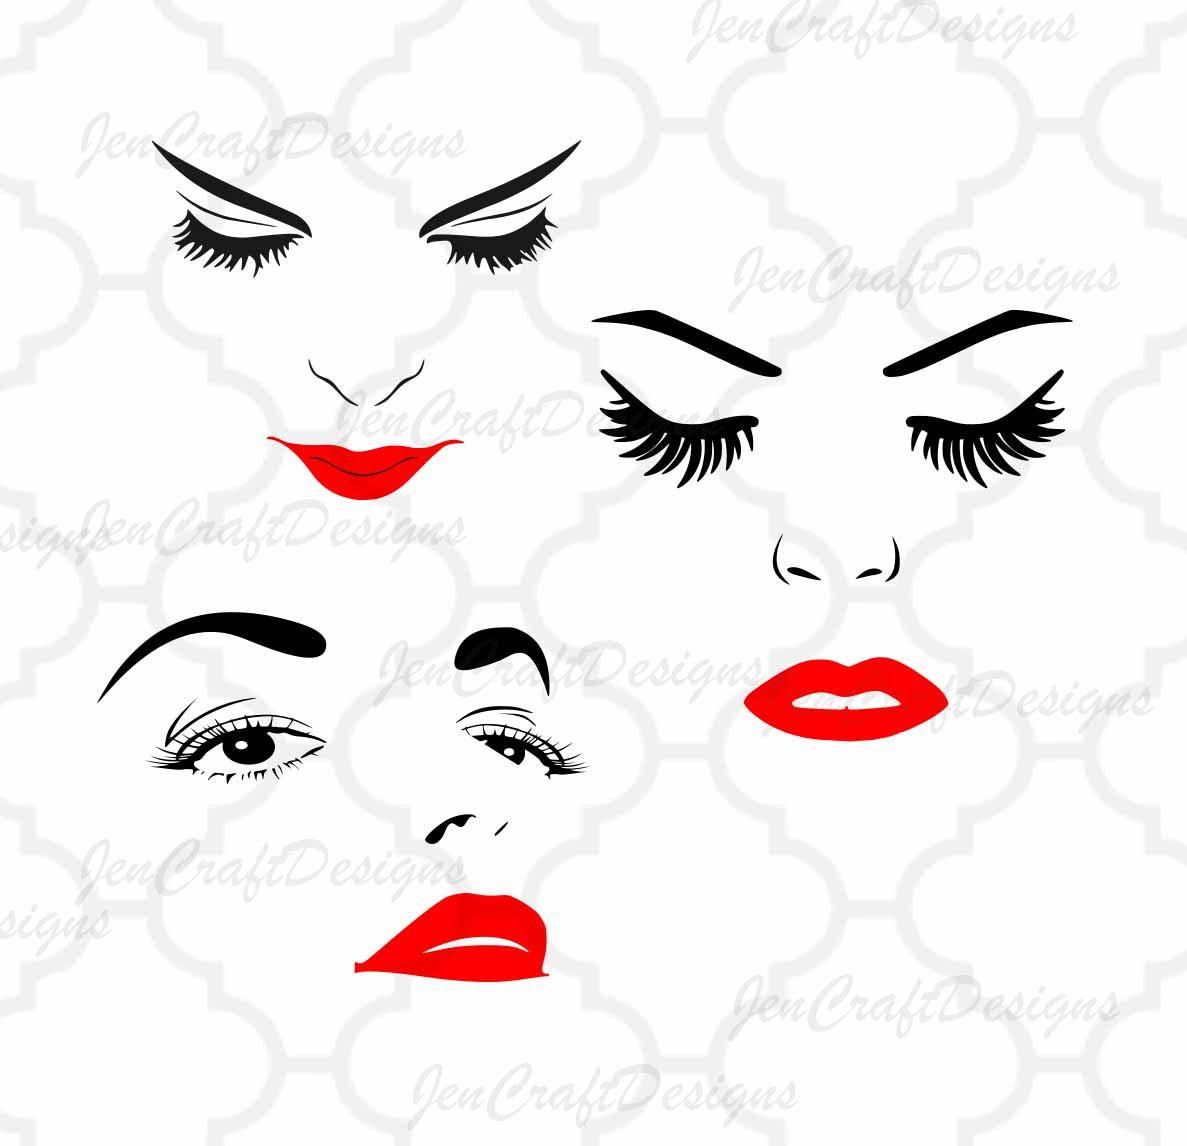 bae16658f283 Women Face Svg, Eyelashes SVG, lips Women Face Clipart, Face SVG ...